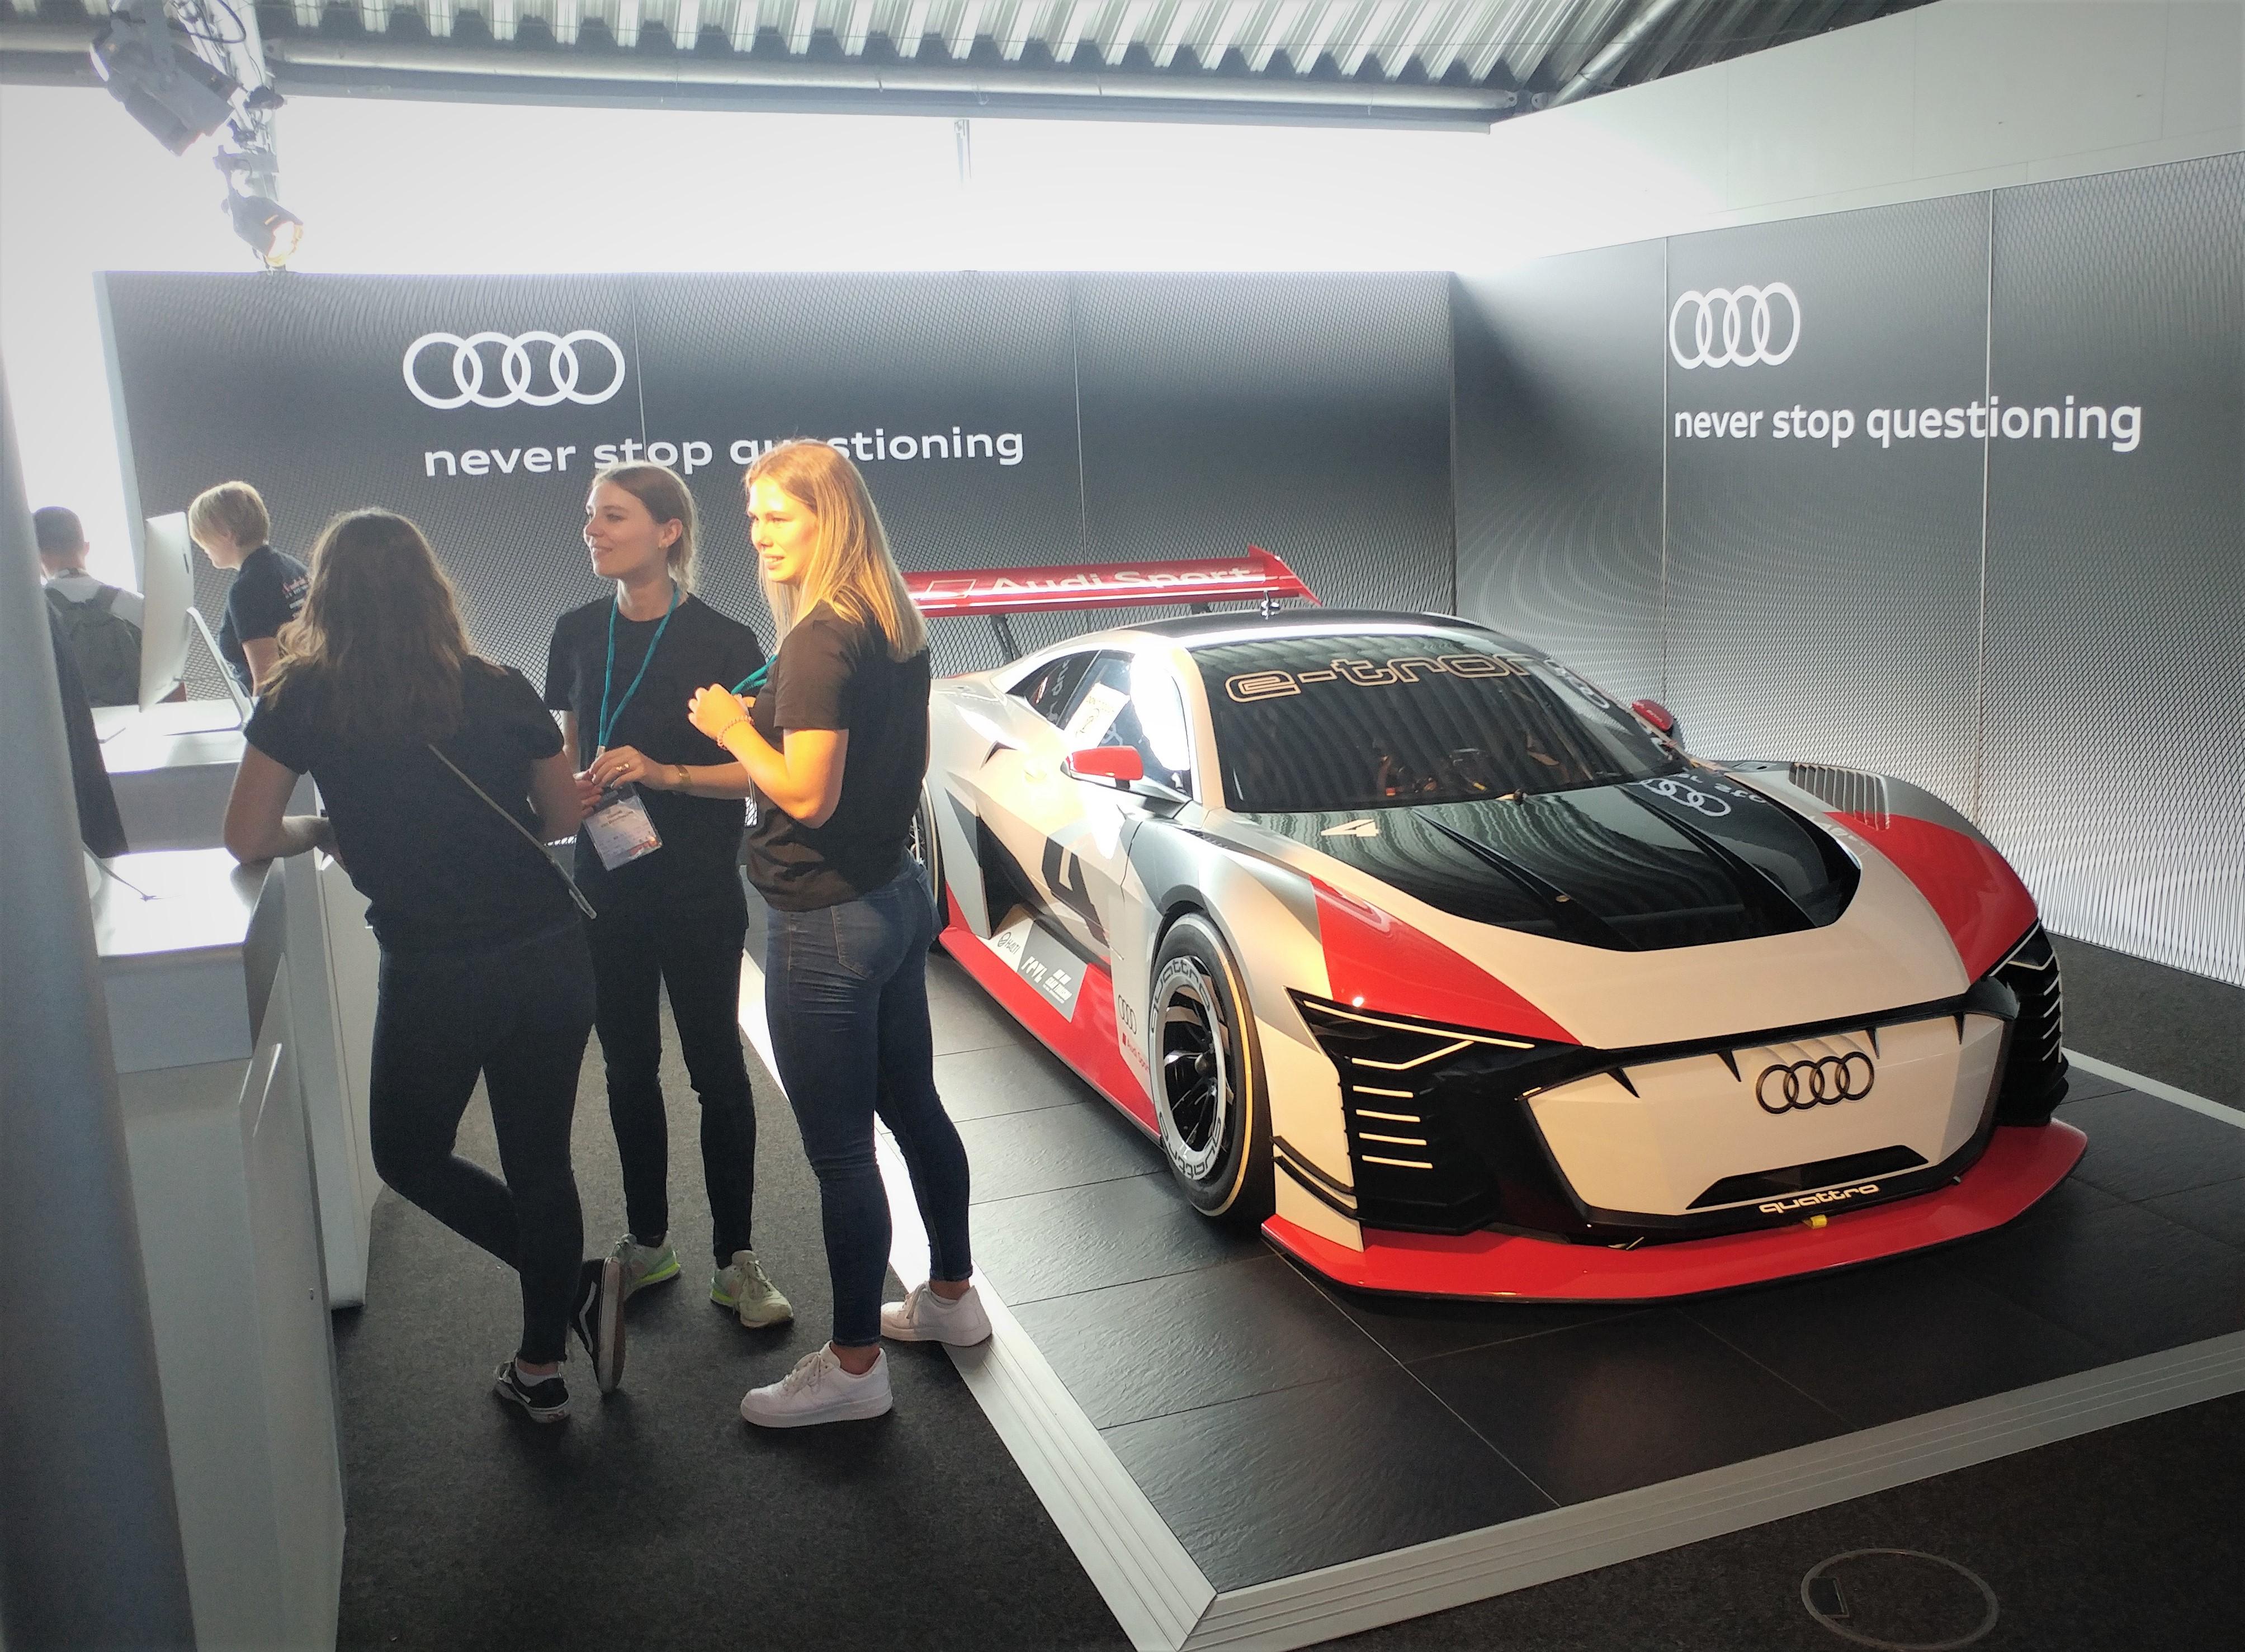 Audi booth 2019-08-08 16.51.09.jpg